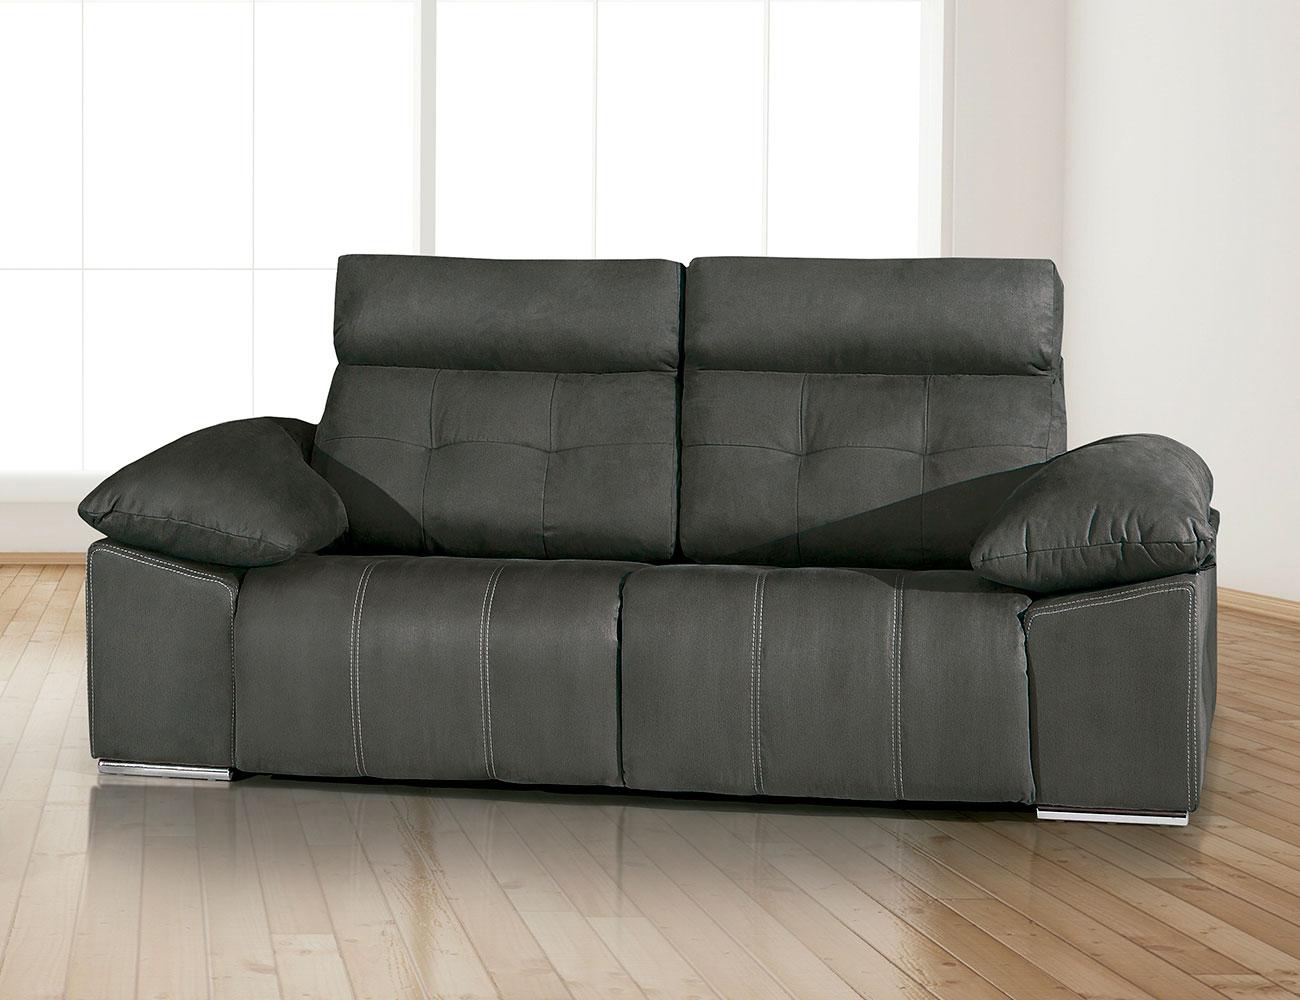 Sofa 3 plazas electrico tejido dante